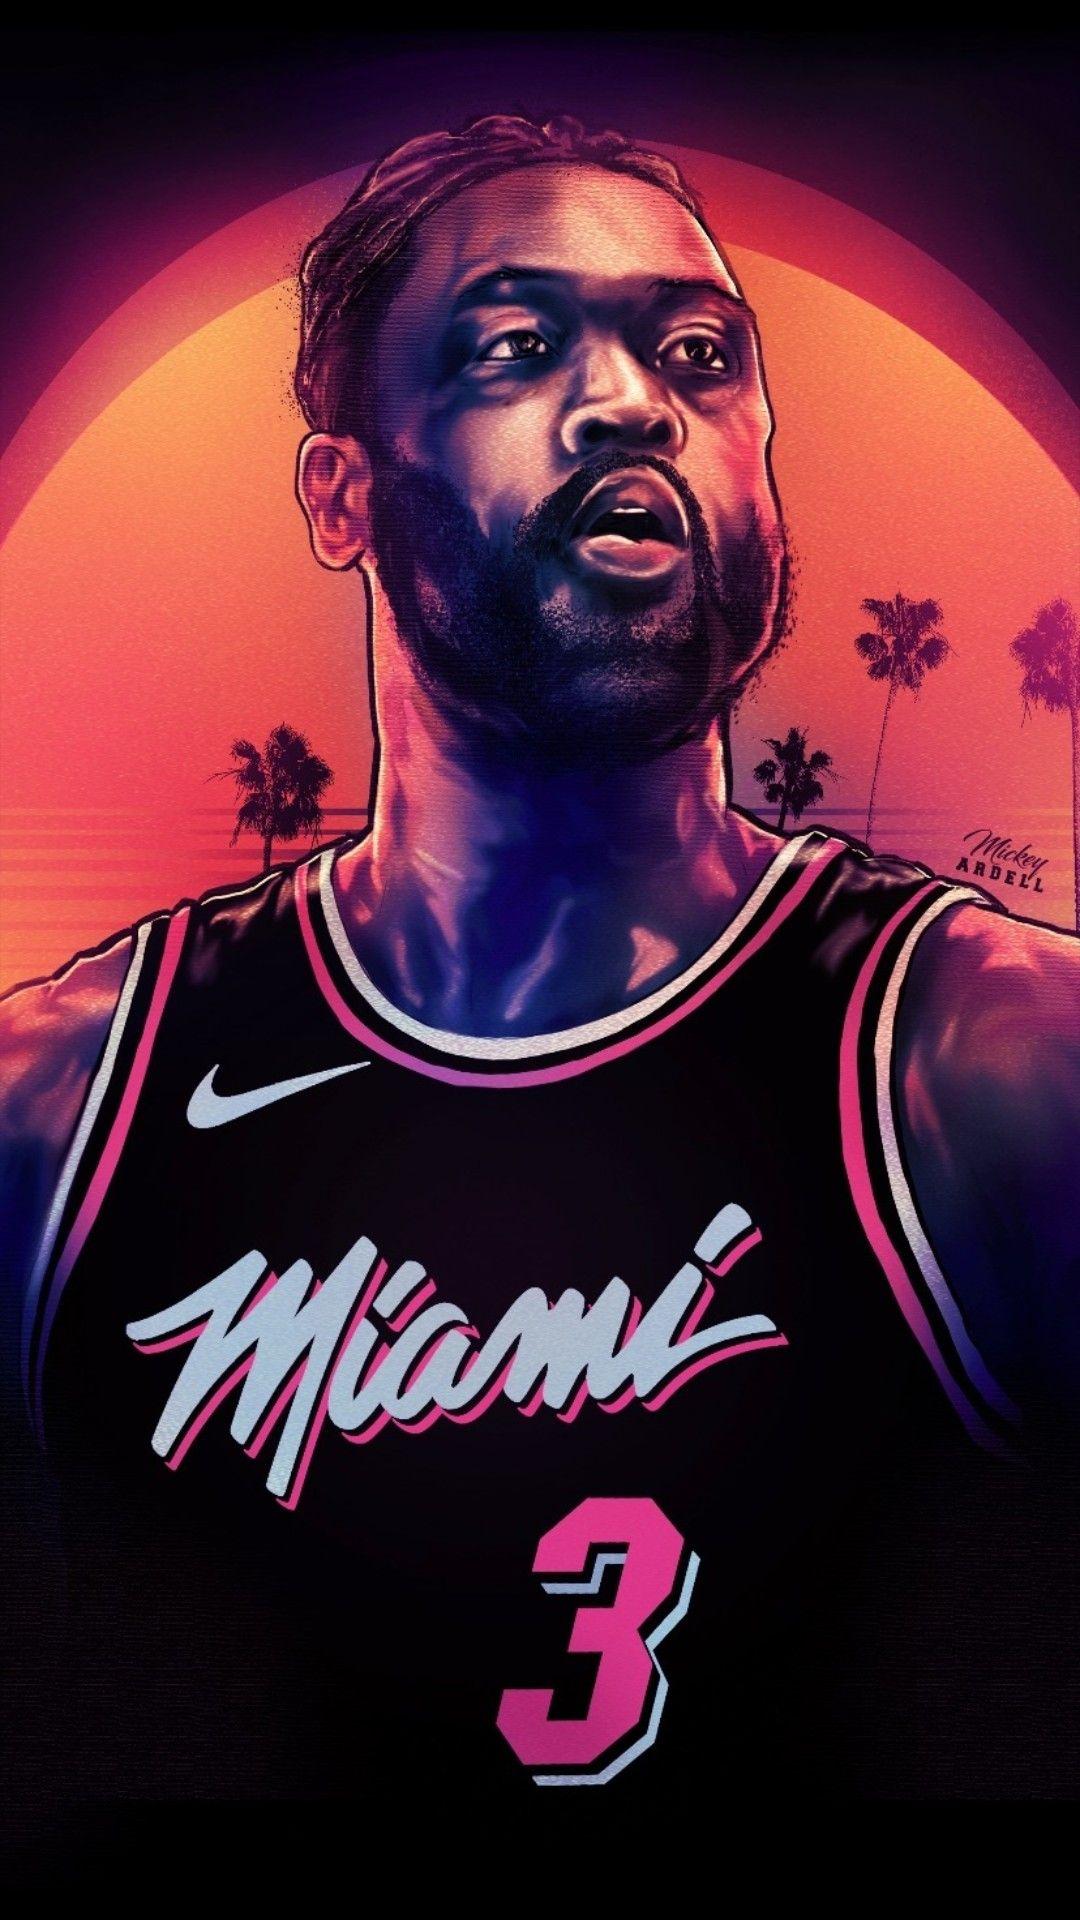 Dwayne Wade Wallpaper Mvp Basketball Nba Basketball Art Nba Pictures